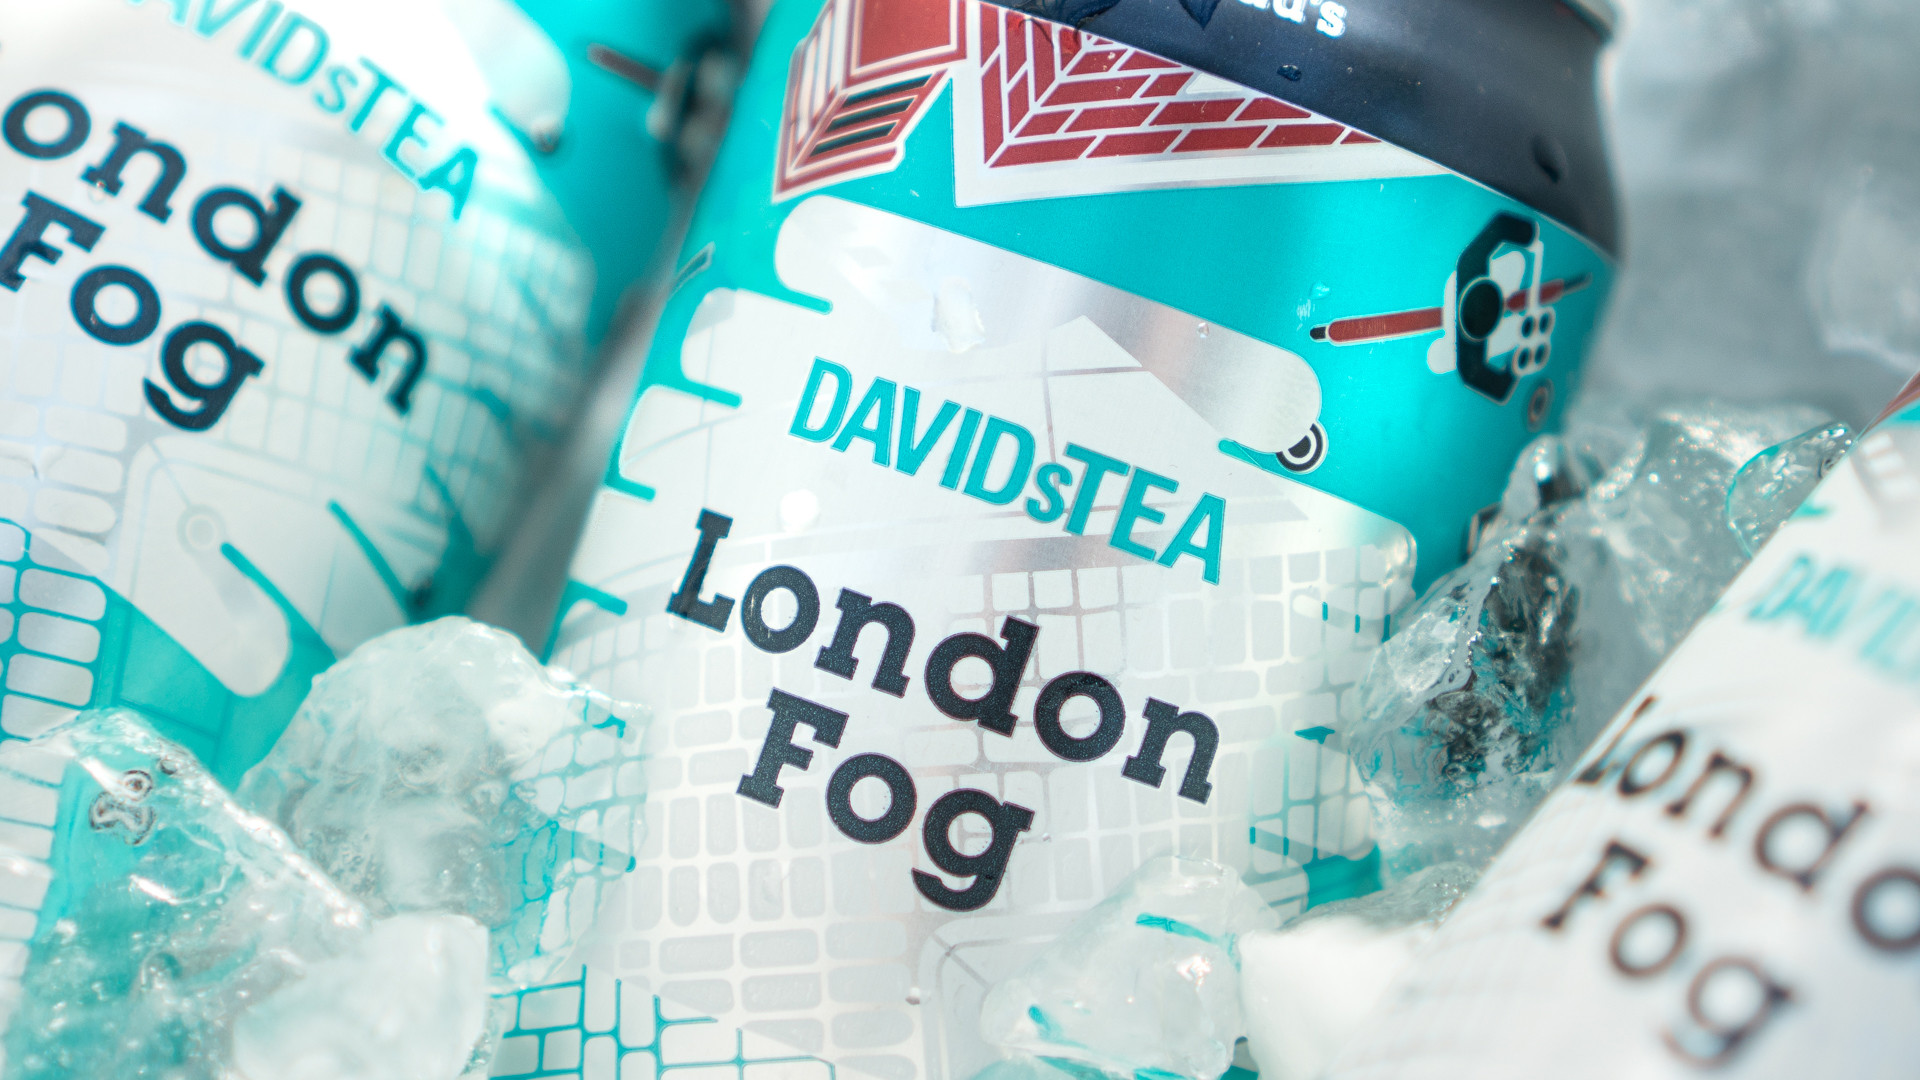 Beau's David's Tea London Fog